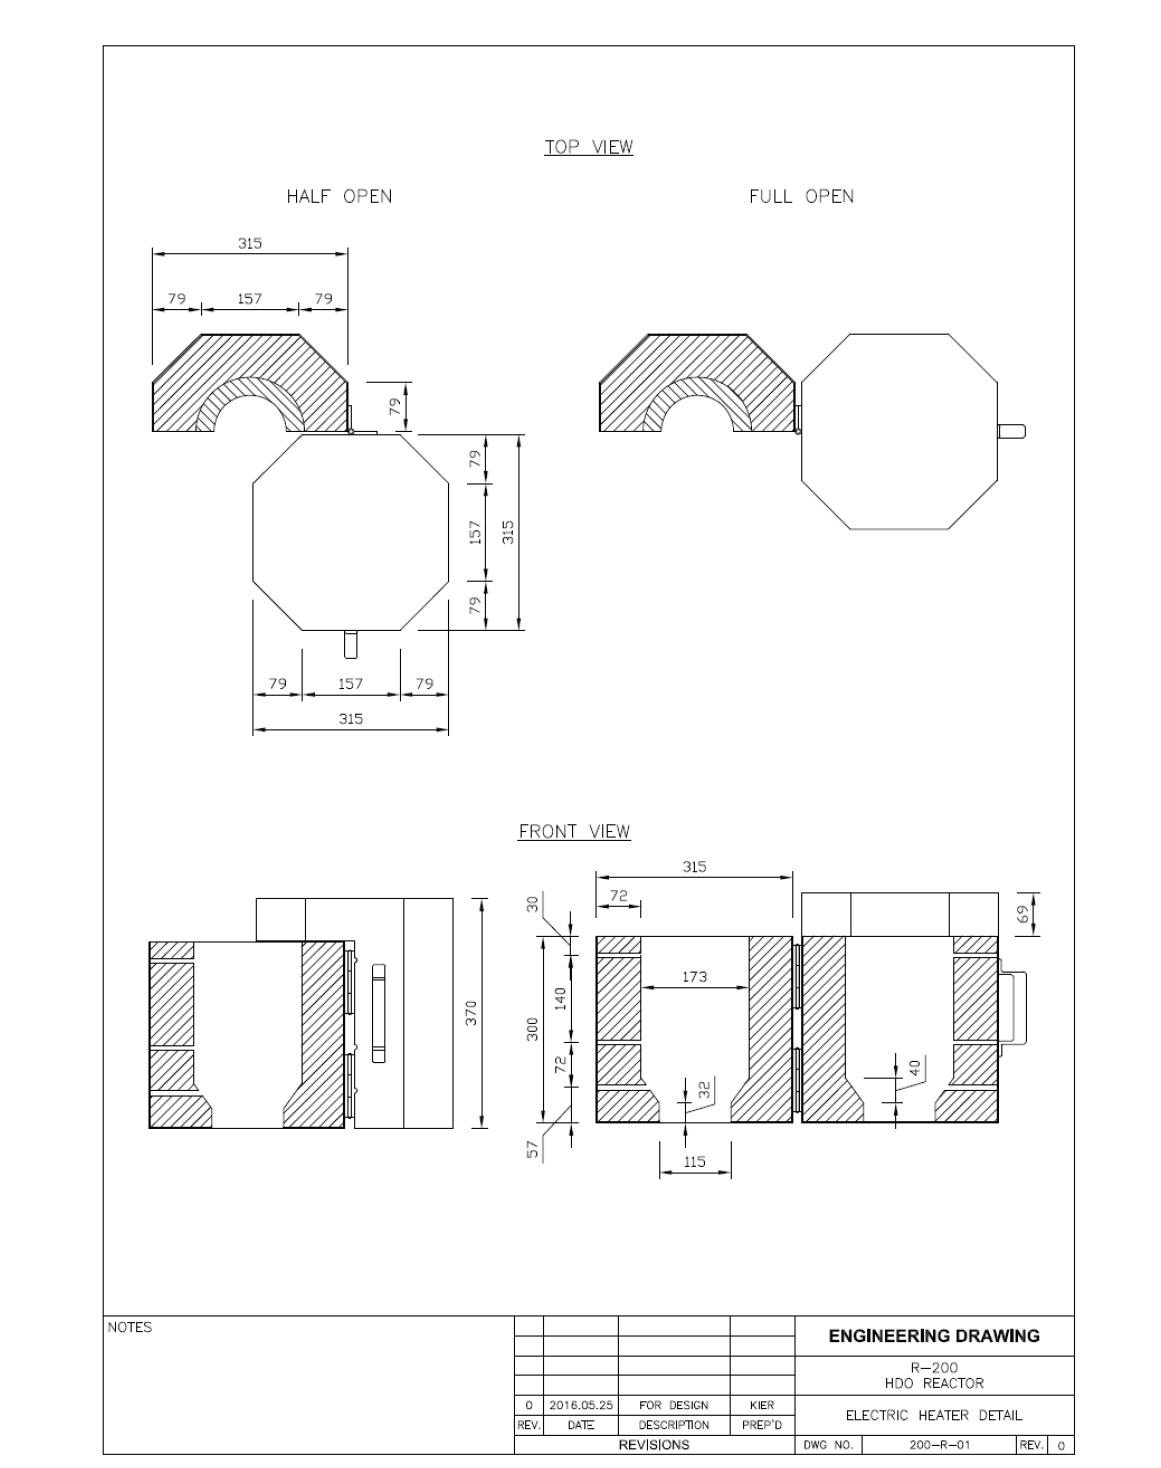 R-200 HDO reactor 제작 도면 (Electric Heater Detail)